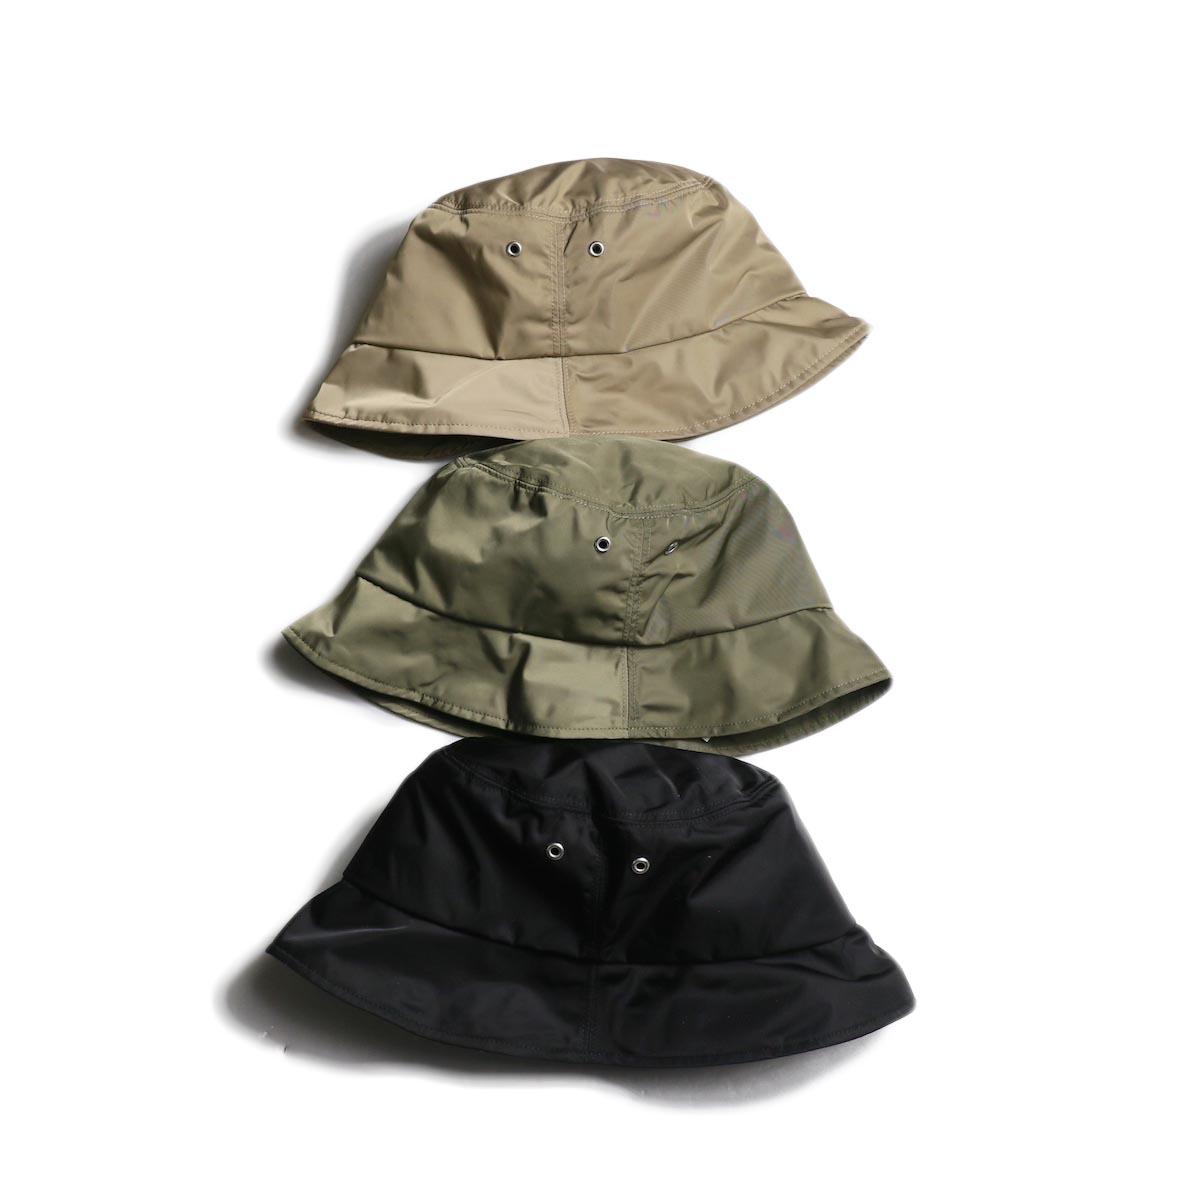 KIJIMA TAKAYUKI / Polyester Twill Bucket Hat (No.201002)